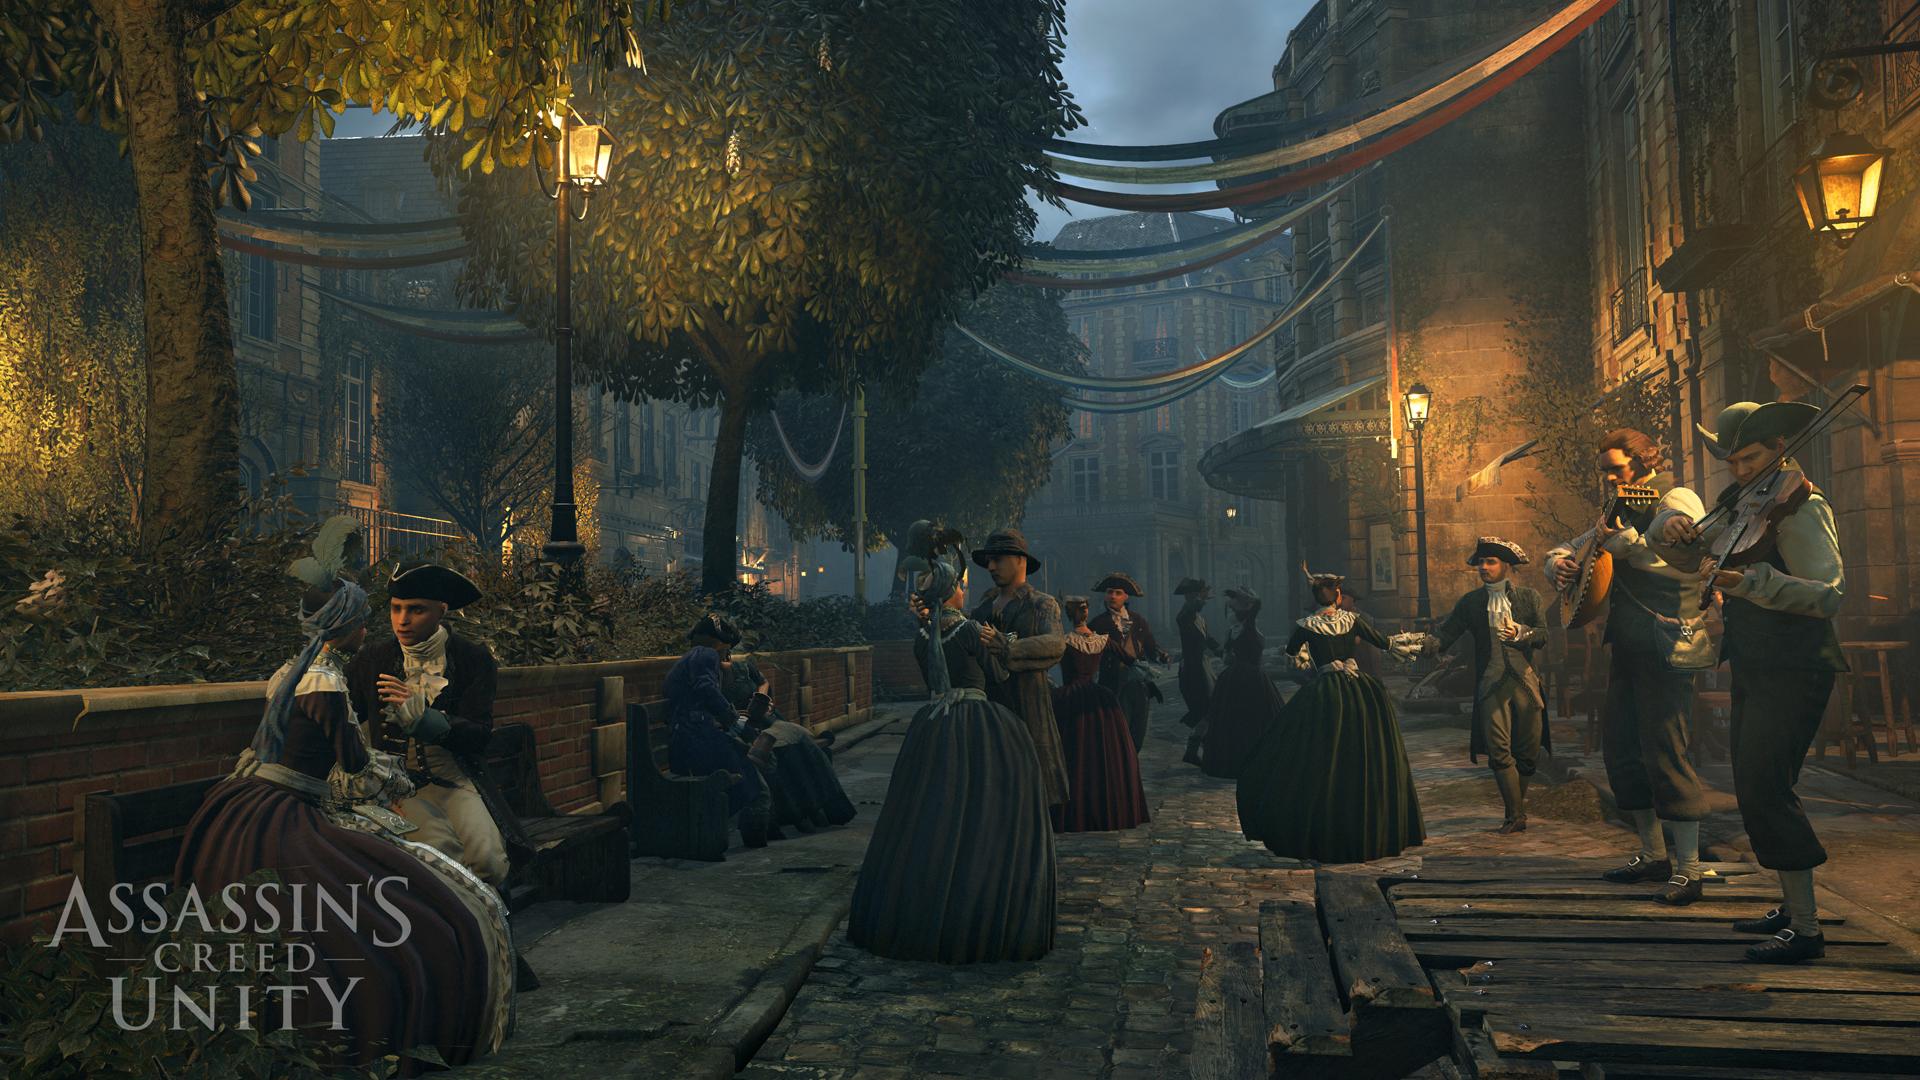 [FIXO] Assassin's Creed Unity Assassin%27s_Creed_Unity_District_LeMarais_166324